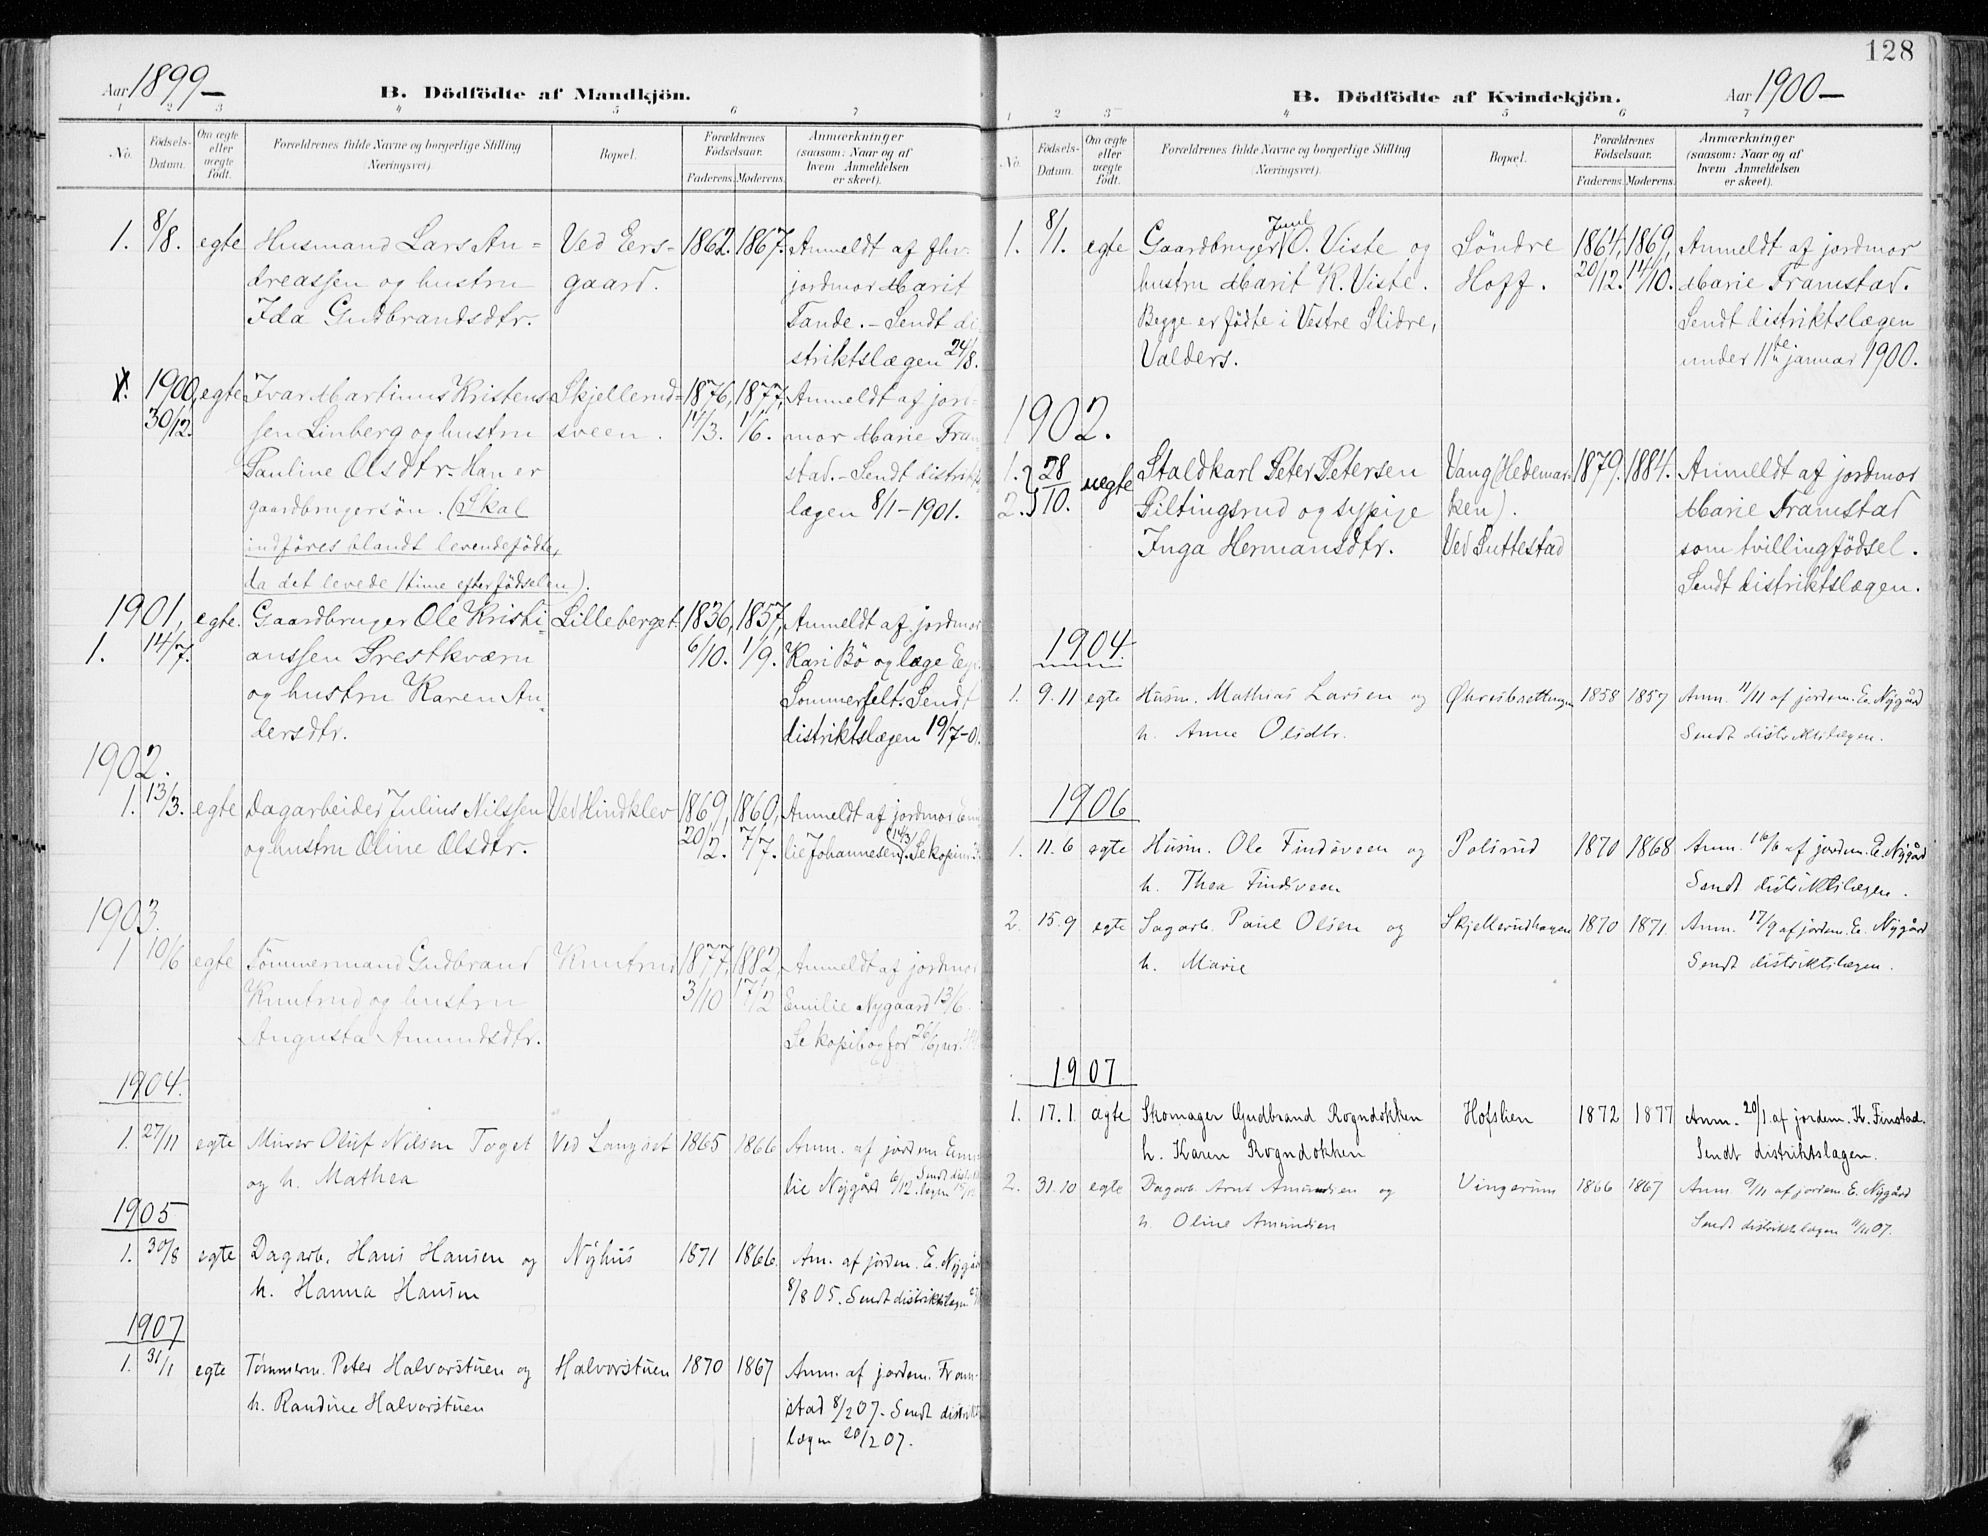 SAH, Fåberg prestekontor, Ministerialbok nr. 11, 1899-1913, s. 128